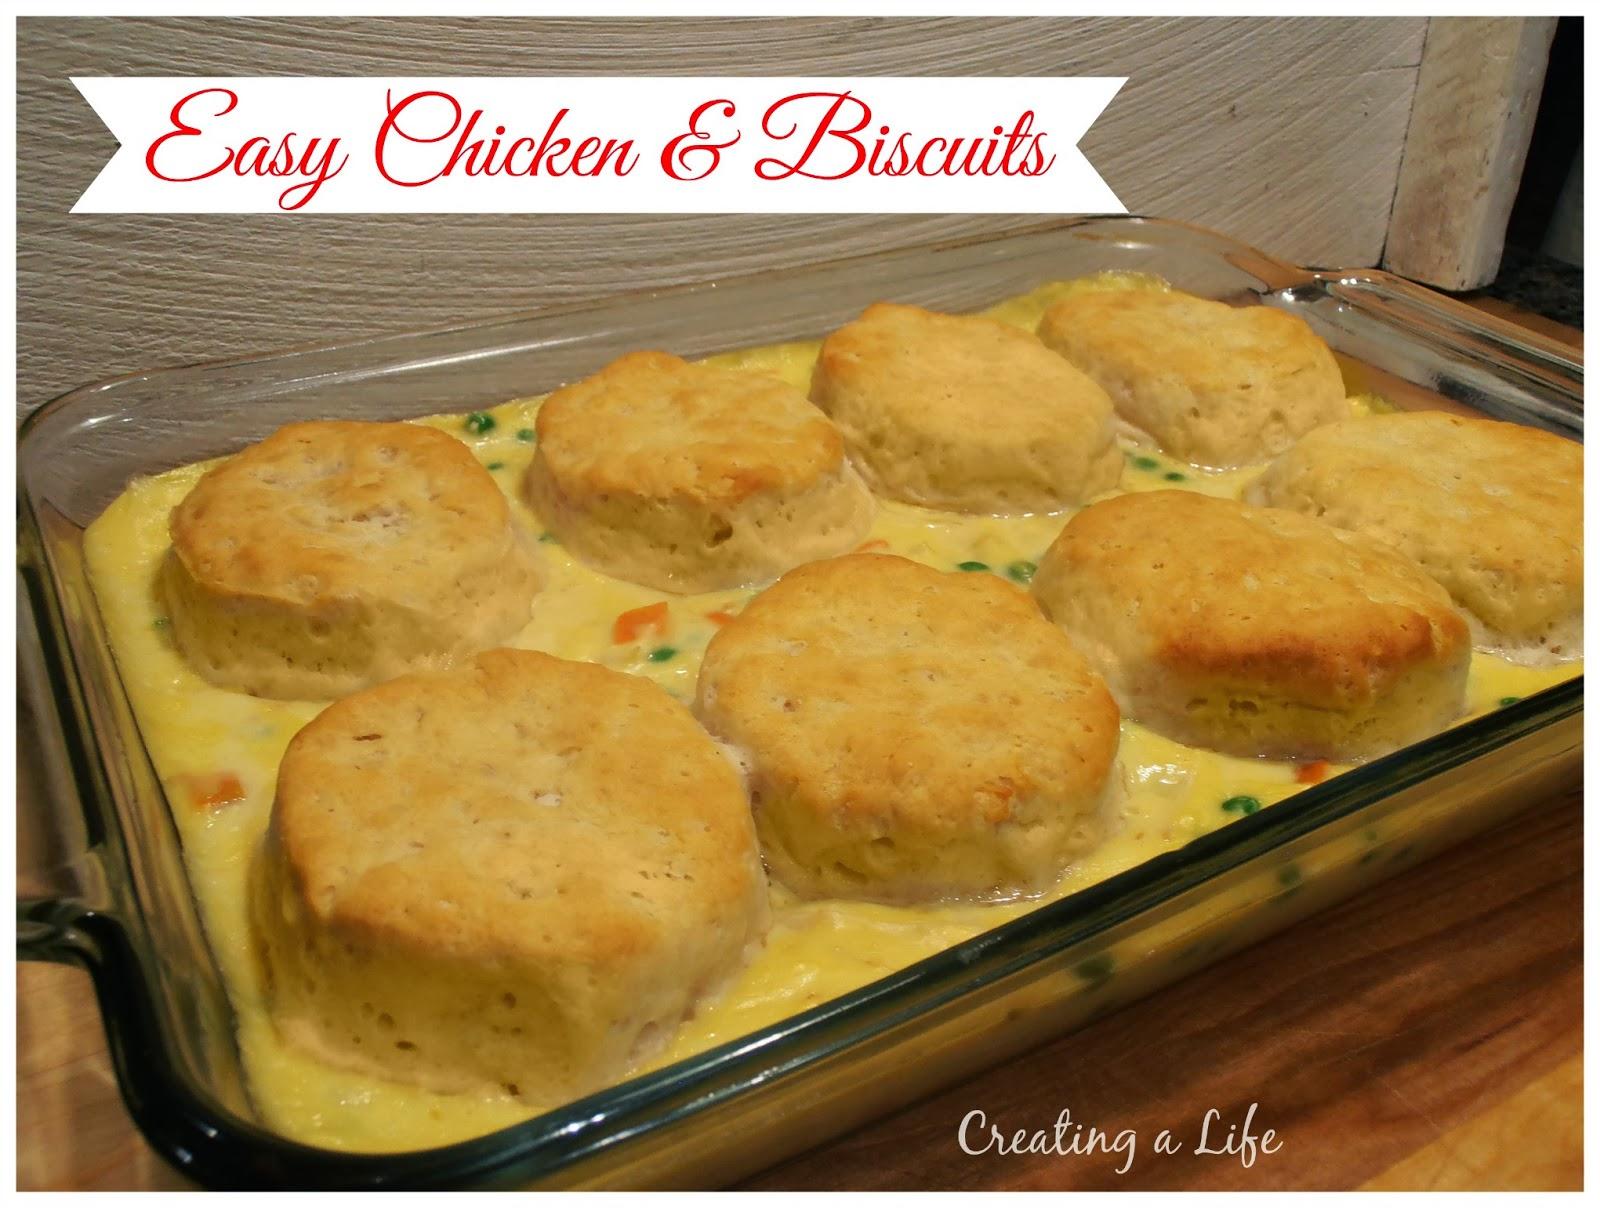 Easy Chicken & Biscuits